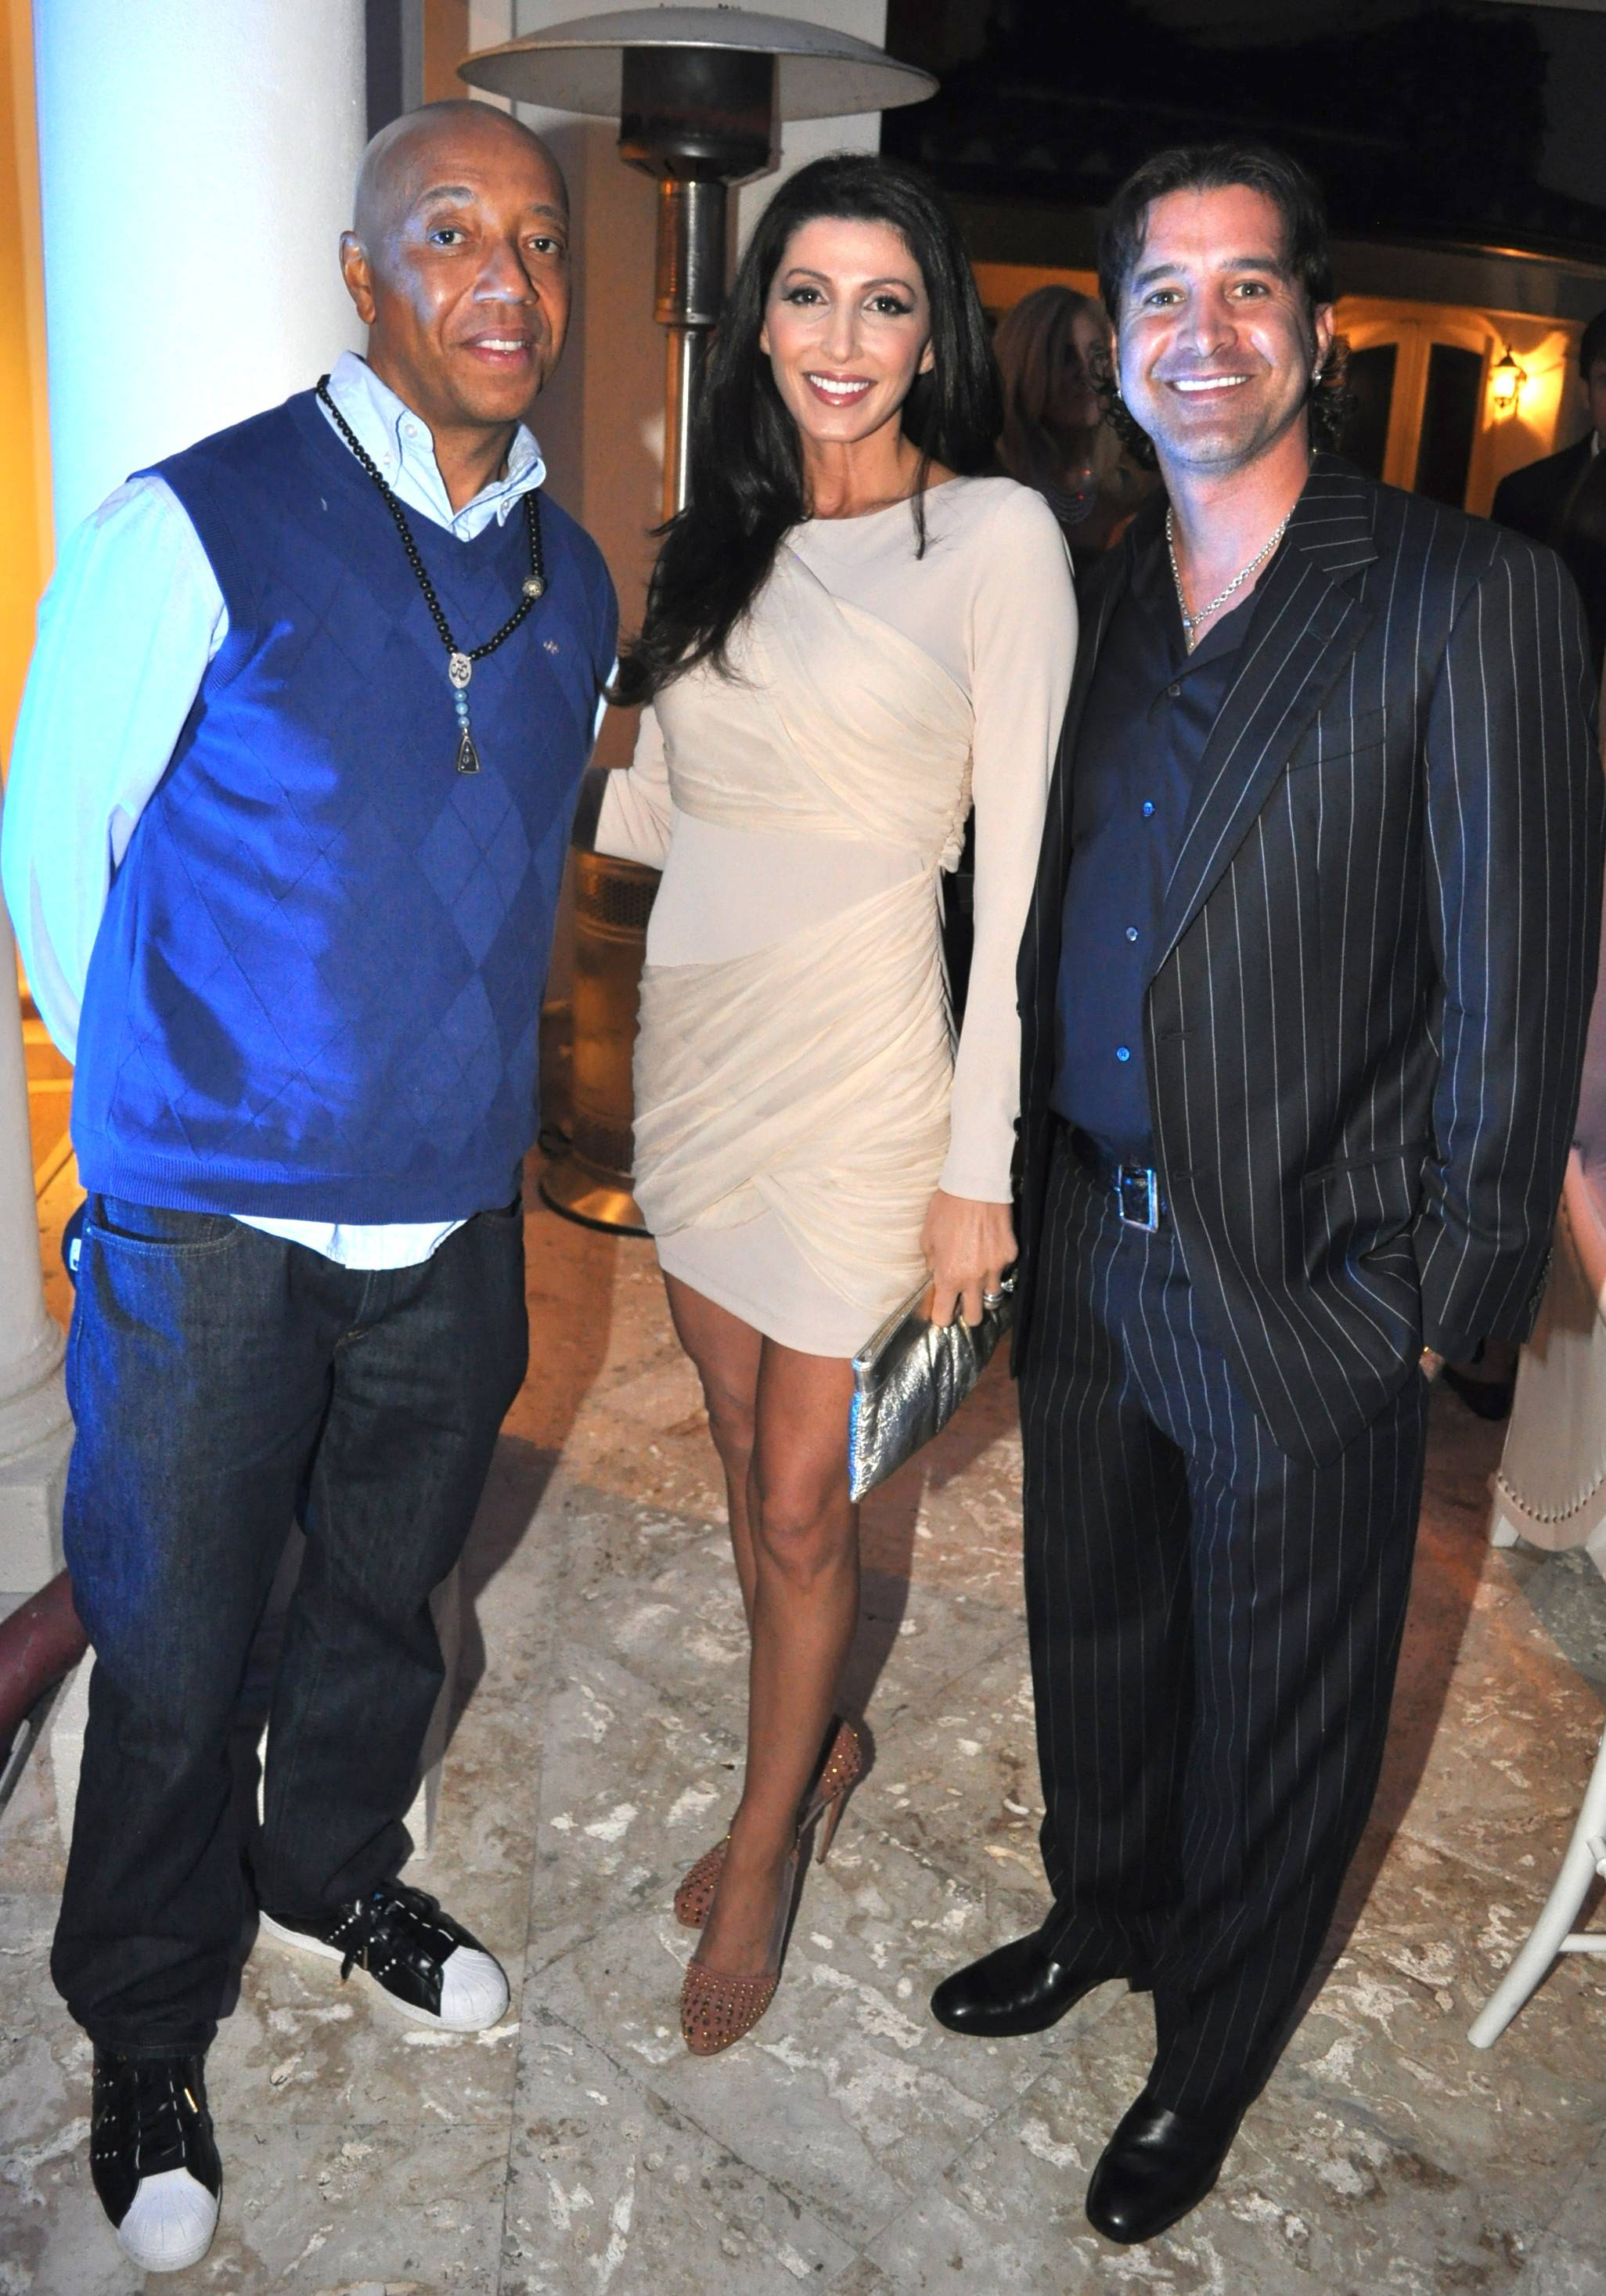 Russell Simmons, Jaclyn & Scott Stapp